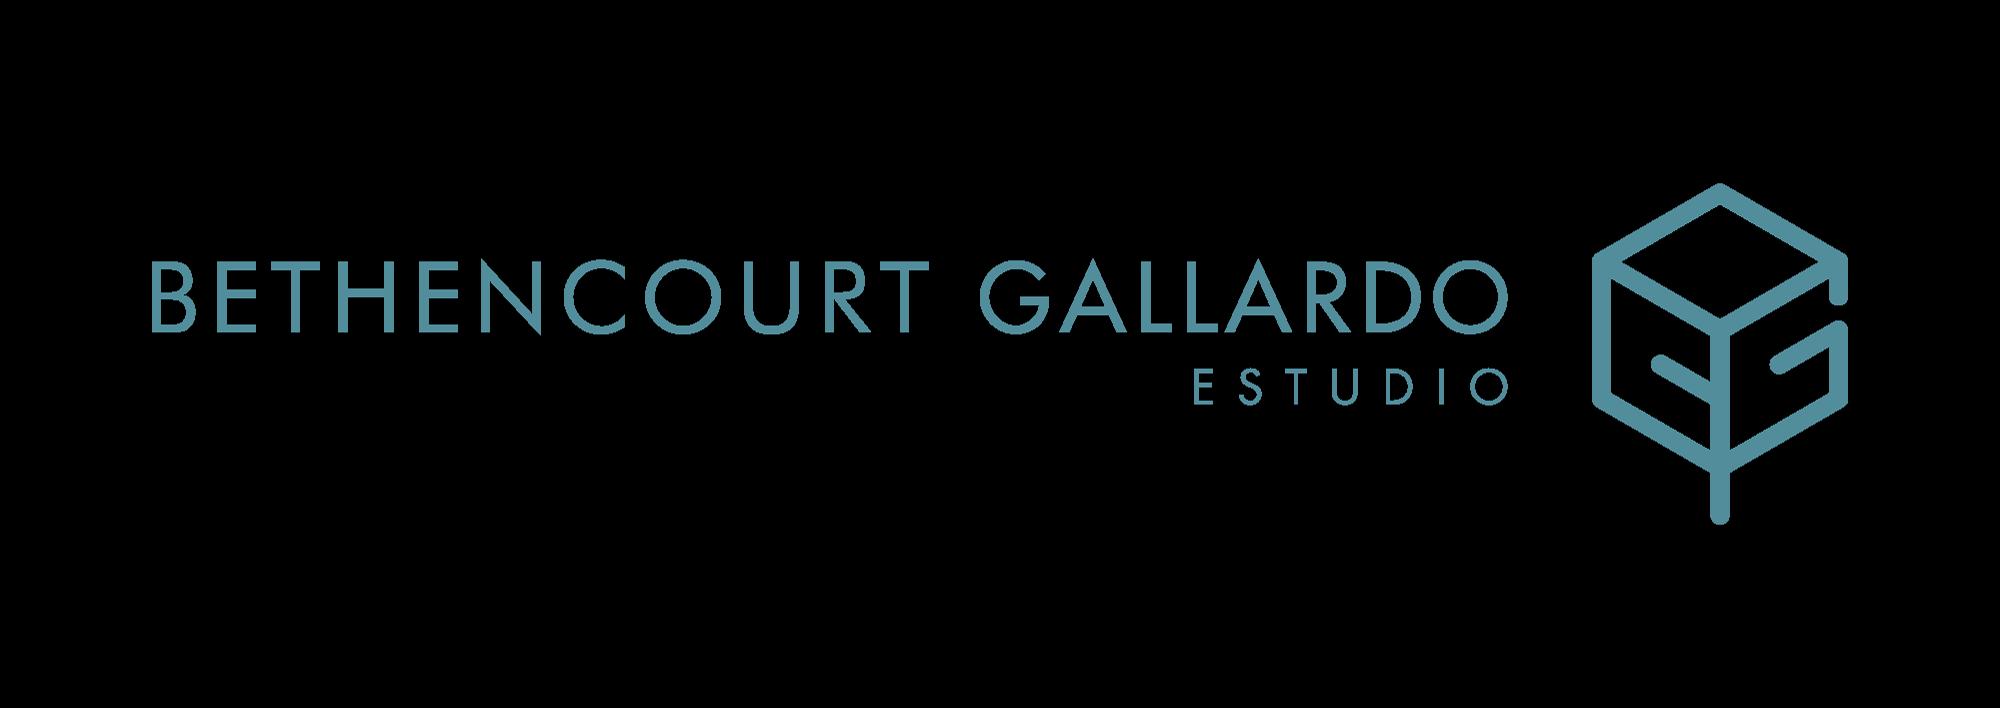 Bethencourt Gallardo Arquitectura